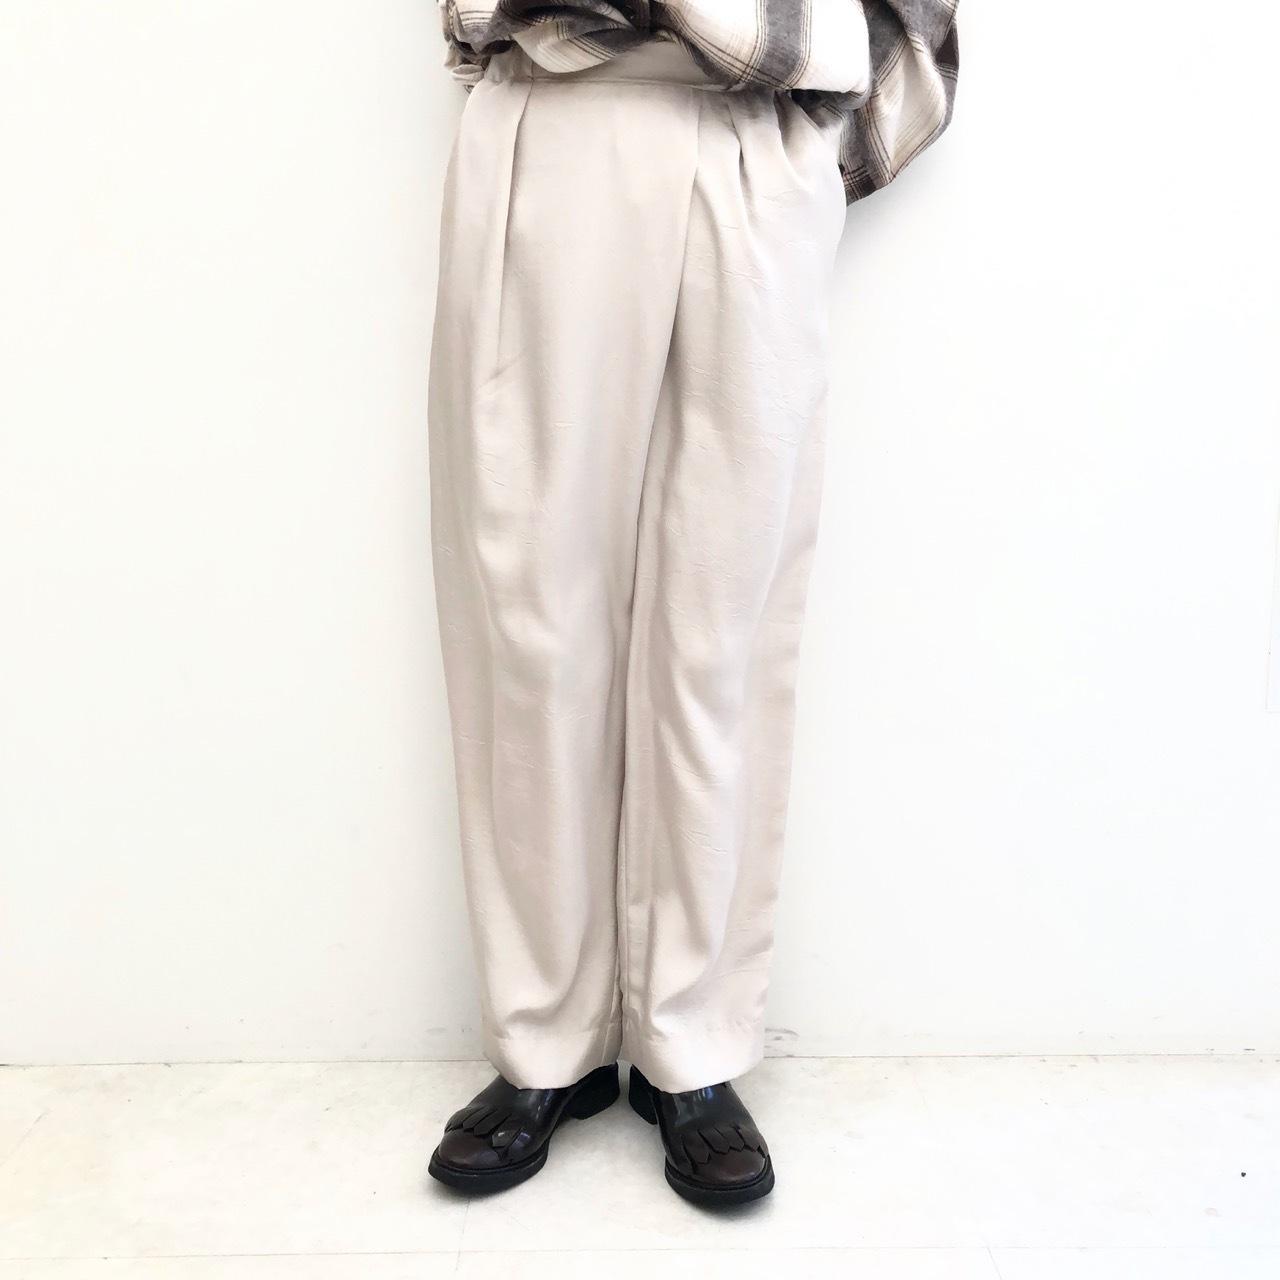 【 CHIGNONSTAR 】- 3692-448 - ワッシャーラップパンツ